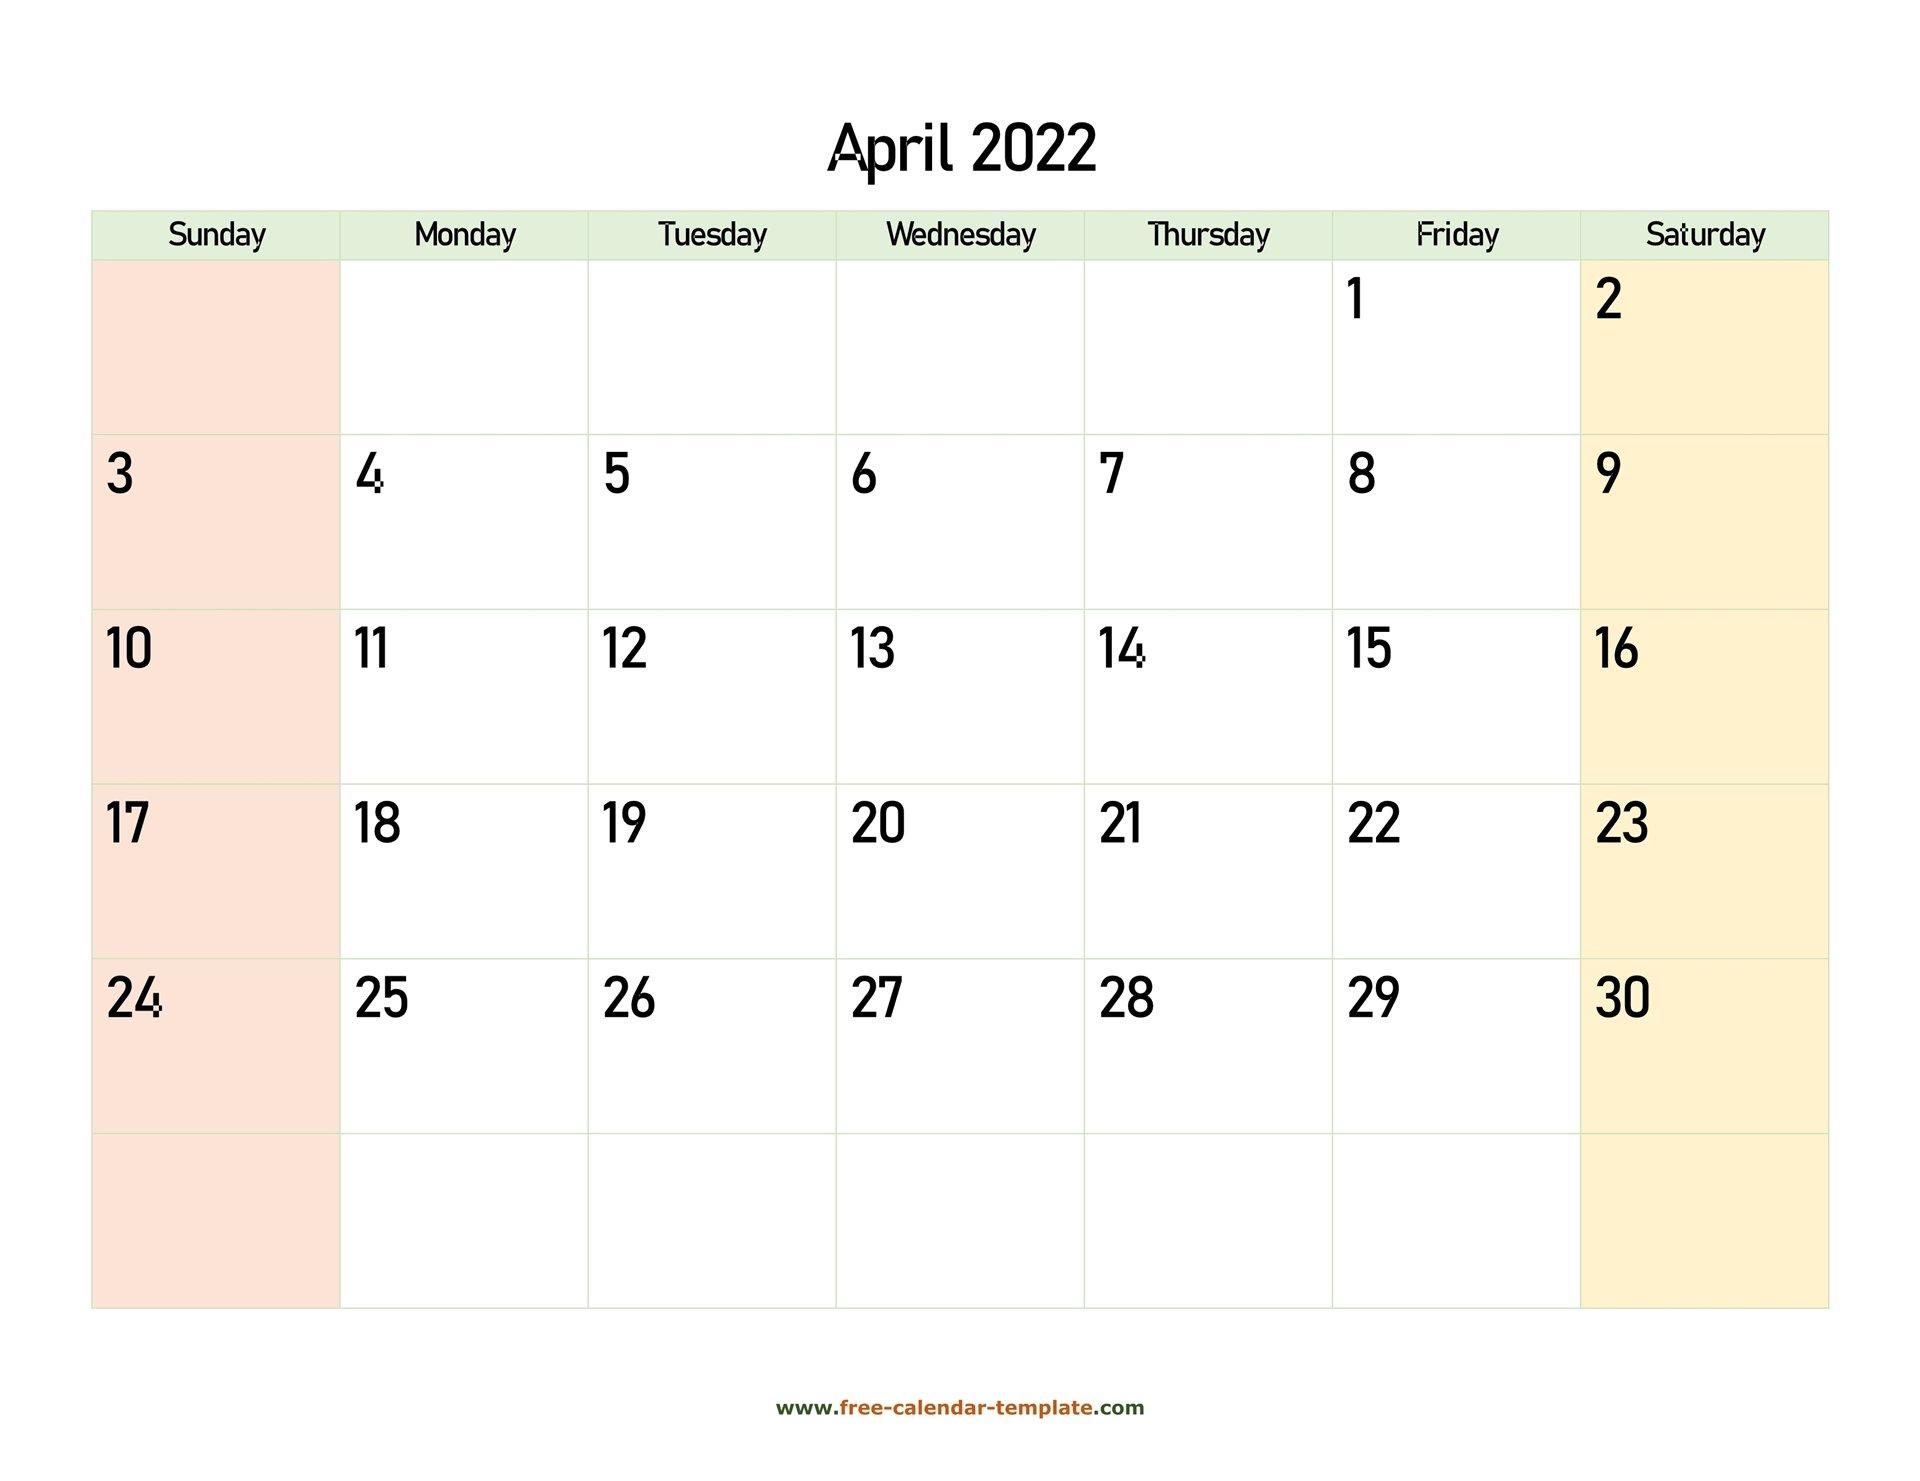 April 2022 Free Calendar Tempplate | Free-Calendar within March & April 2022 Calendar Free Printable Image